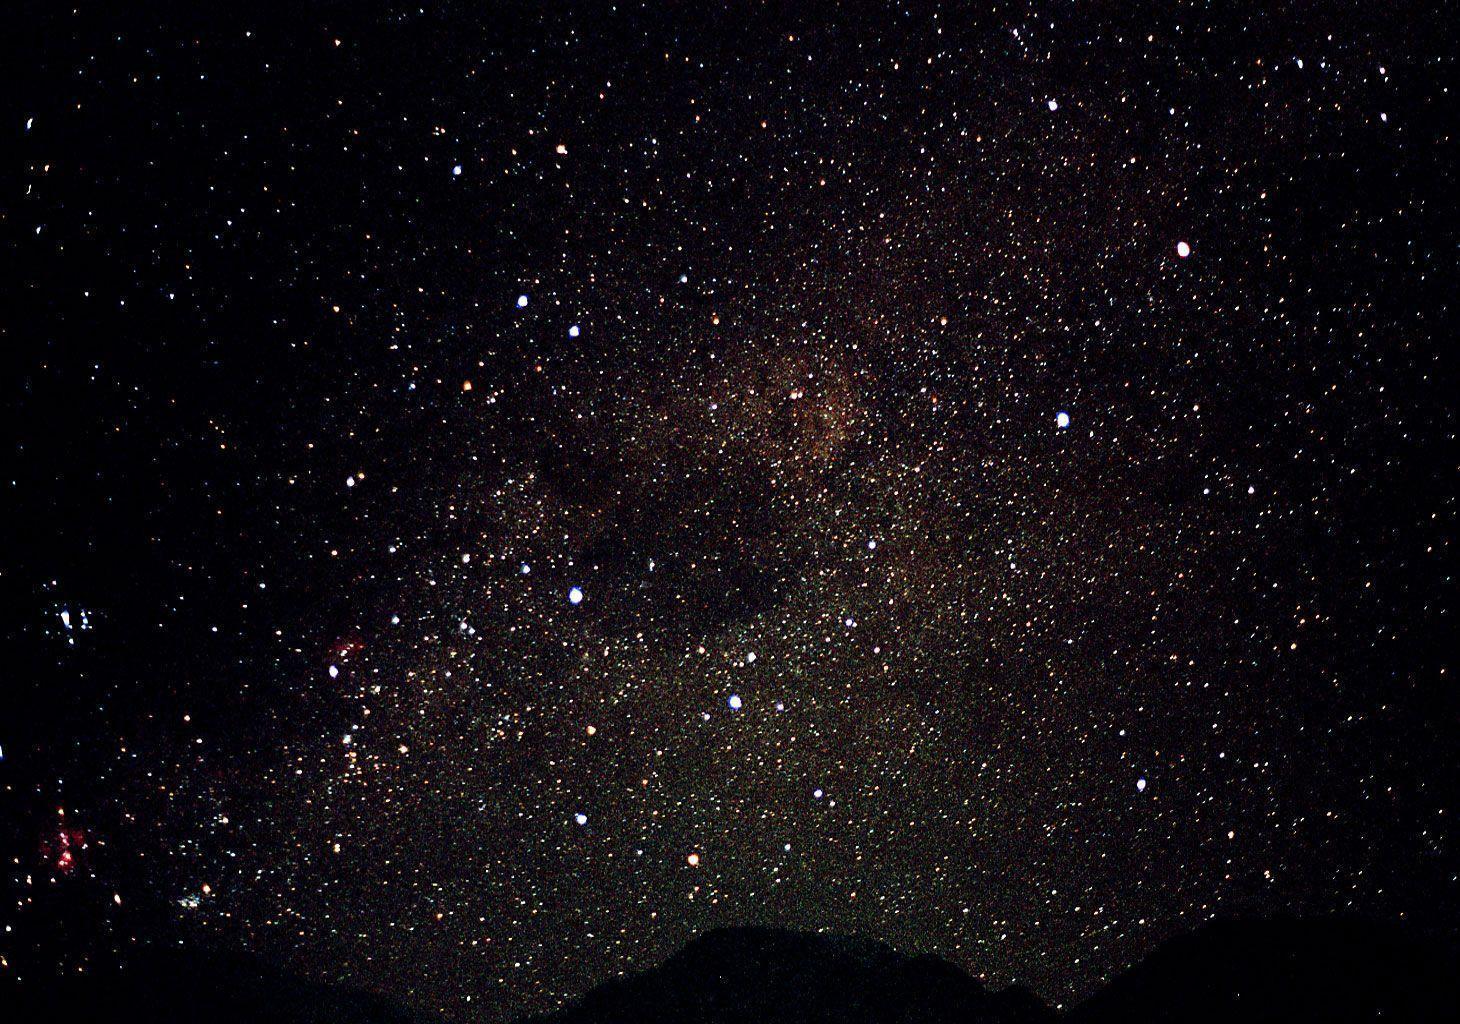 stars at night wallpaper - photo #12